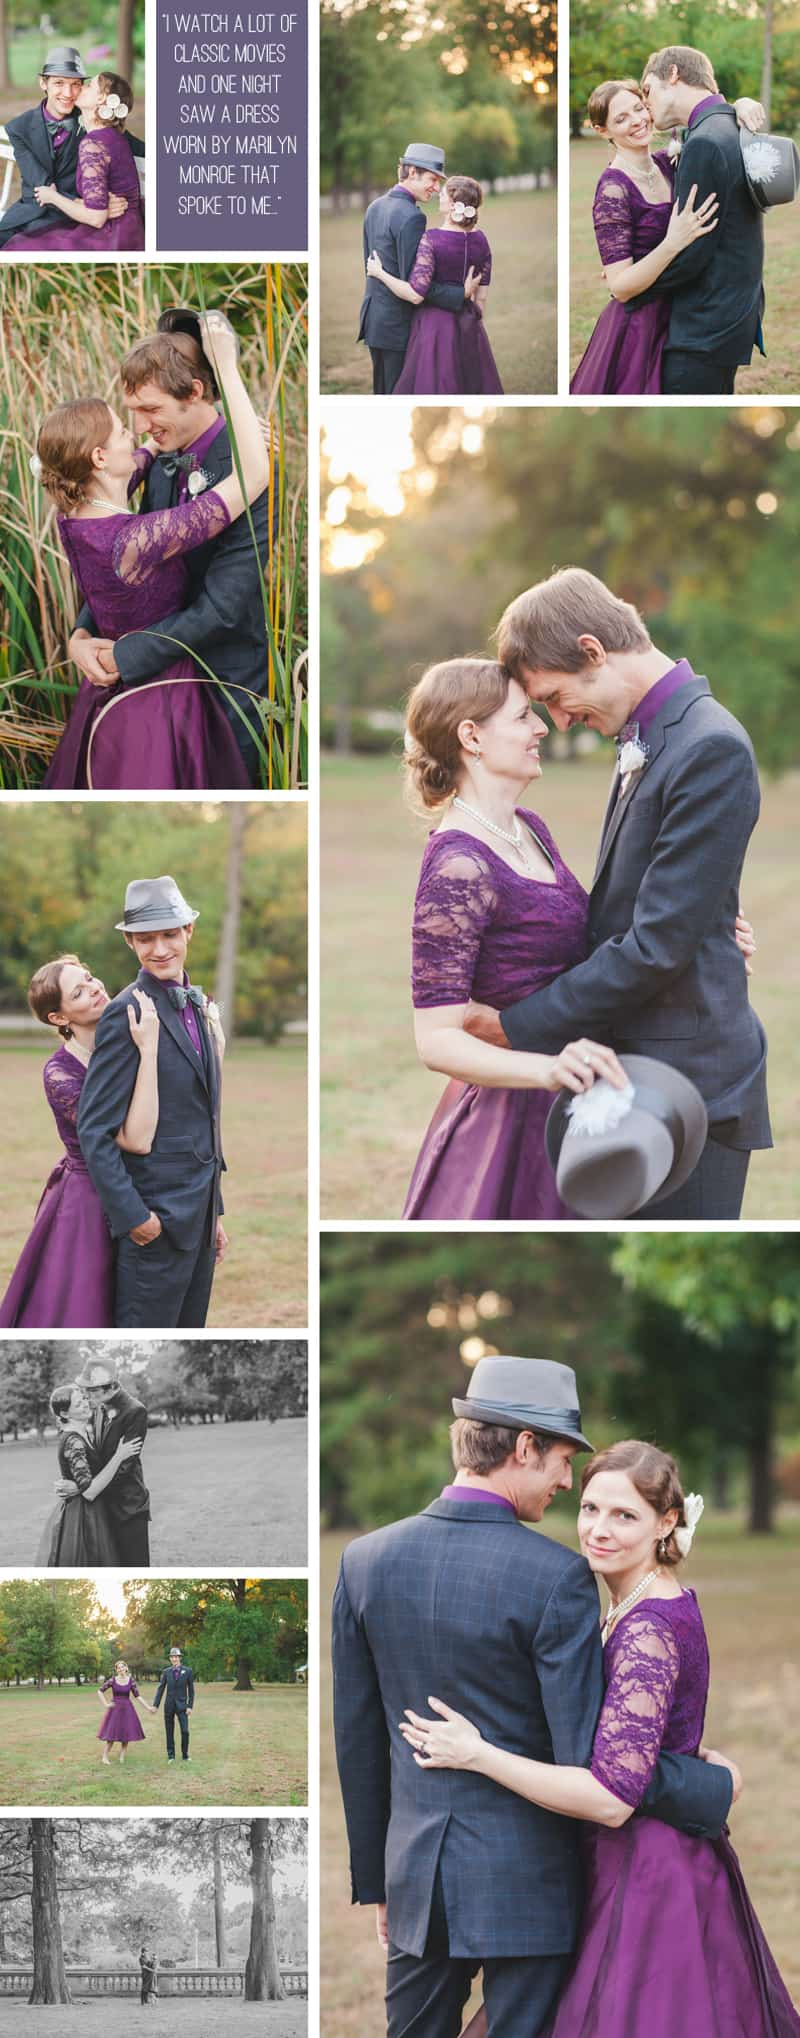 A Purple Wedding Dress For a Backyard Wedding 6